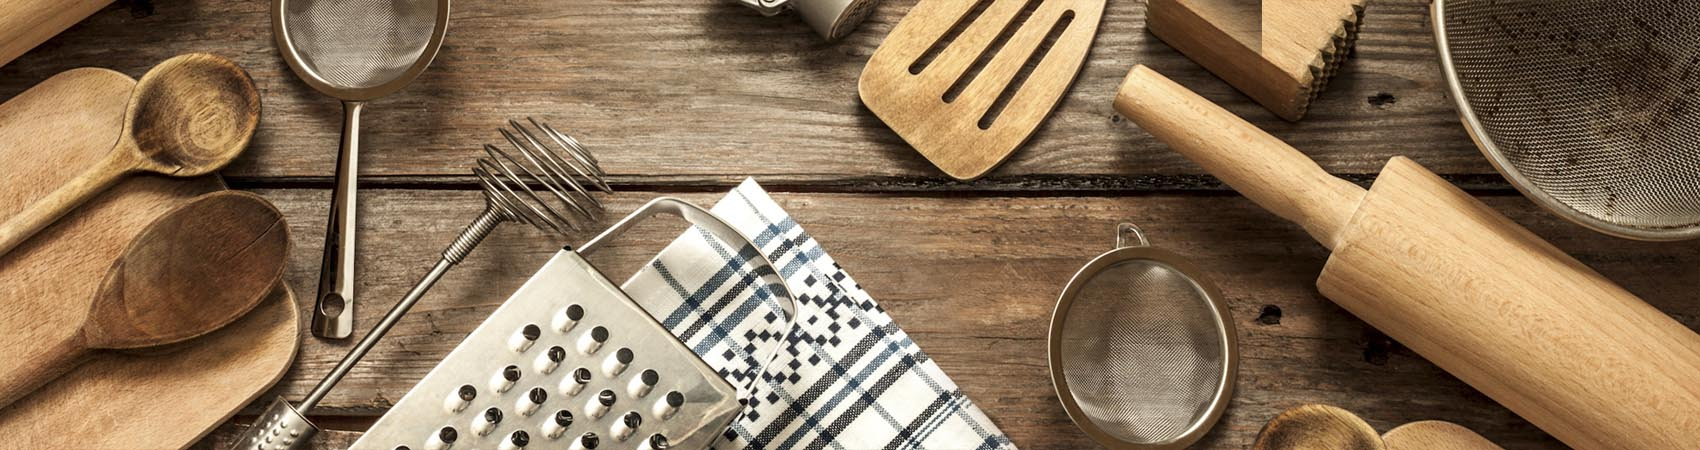 Gli utensili indispensabili in cucina - Misya Magazine